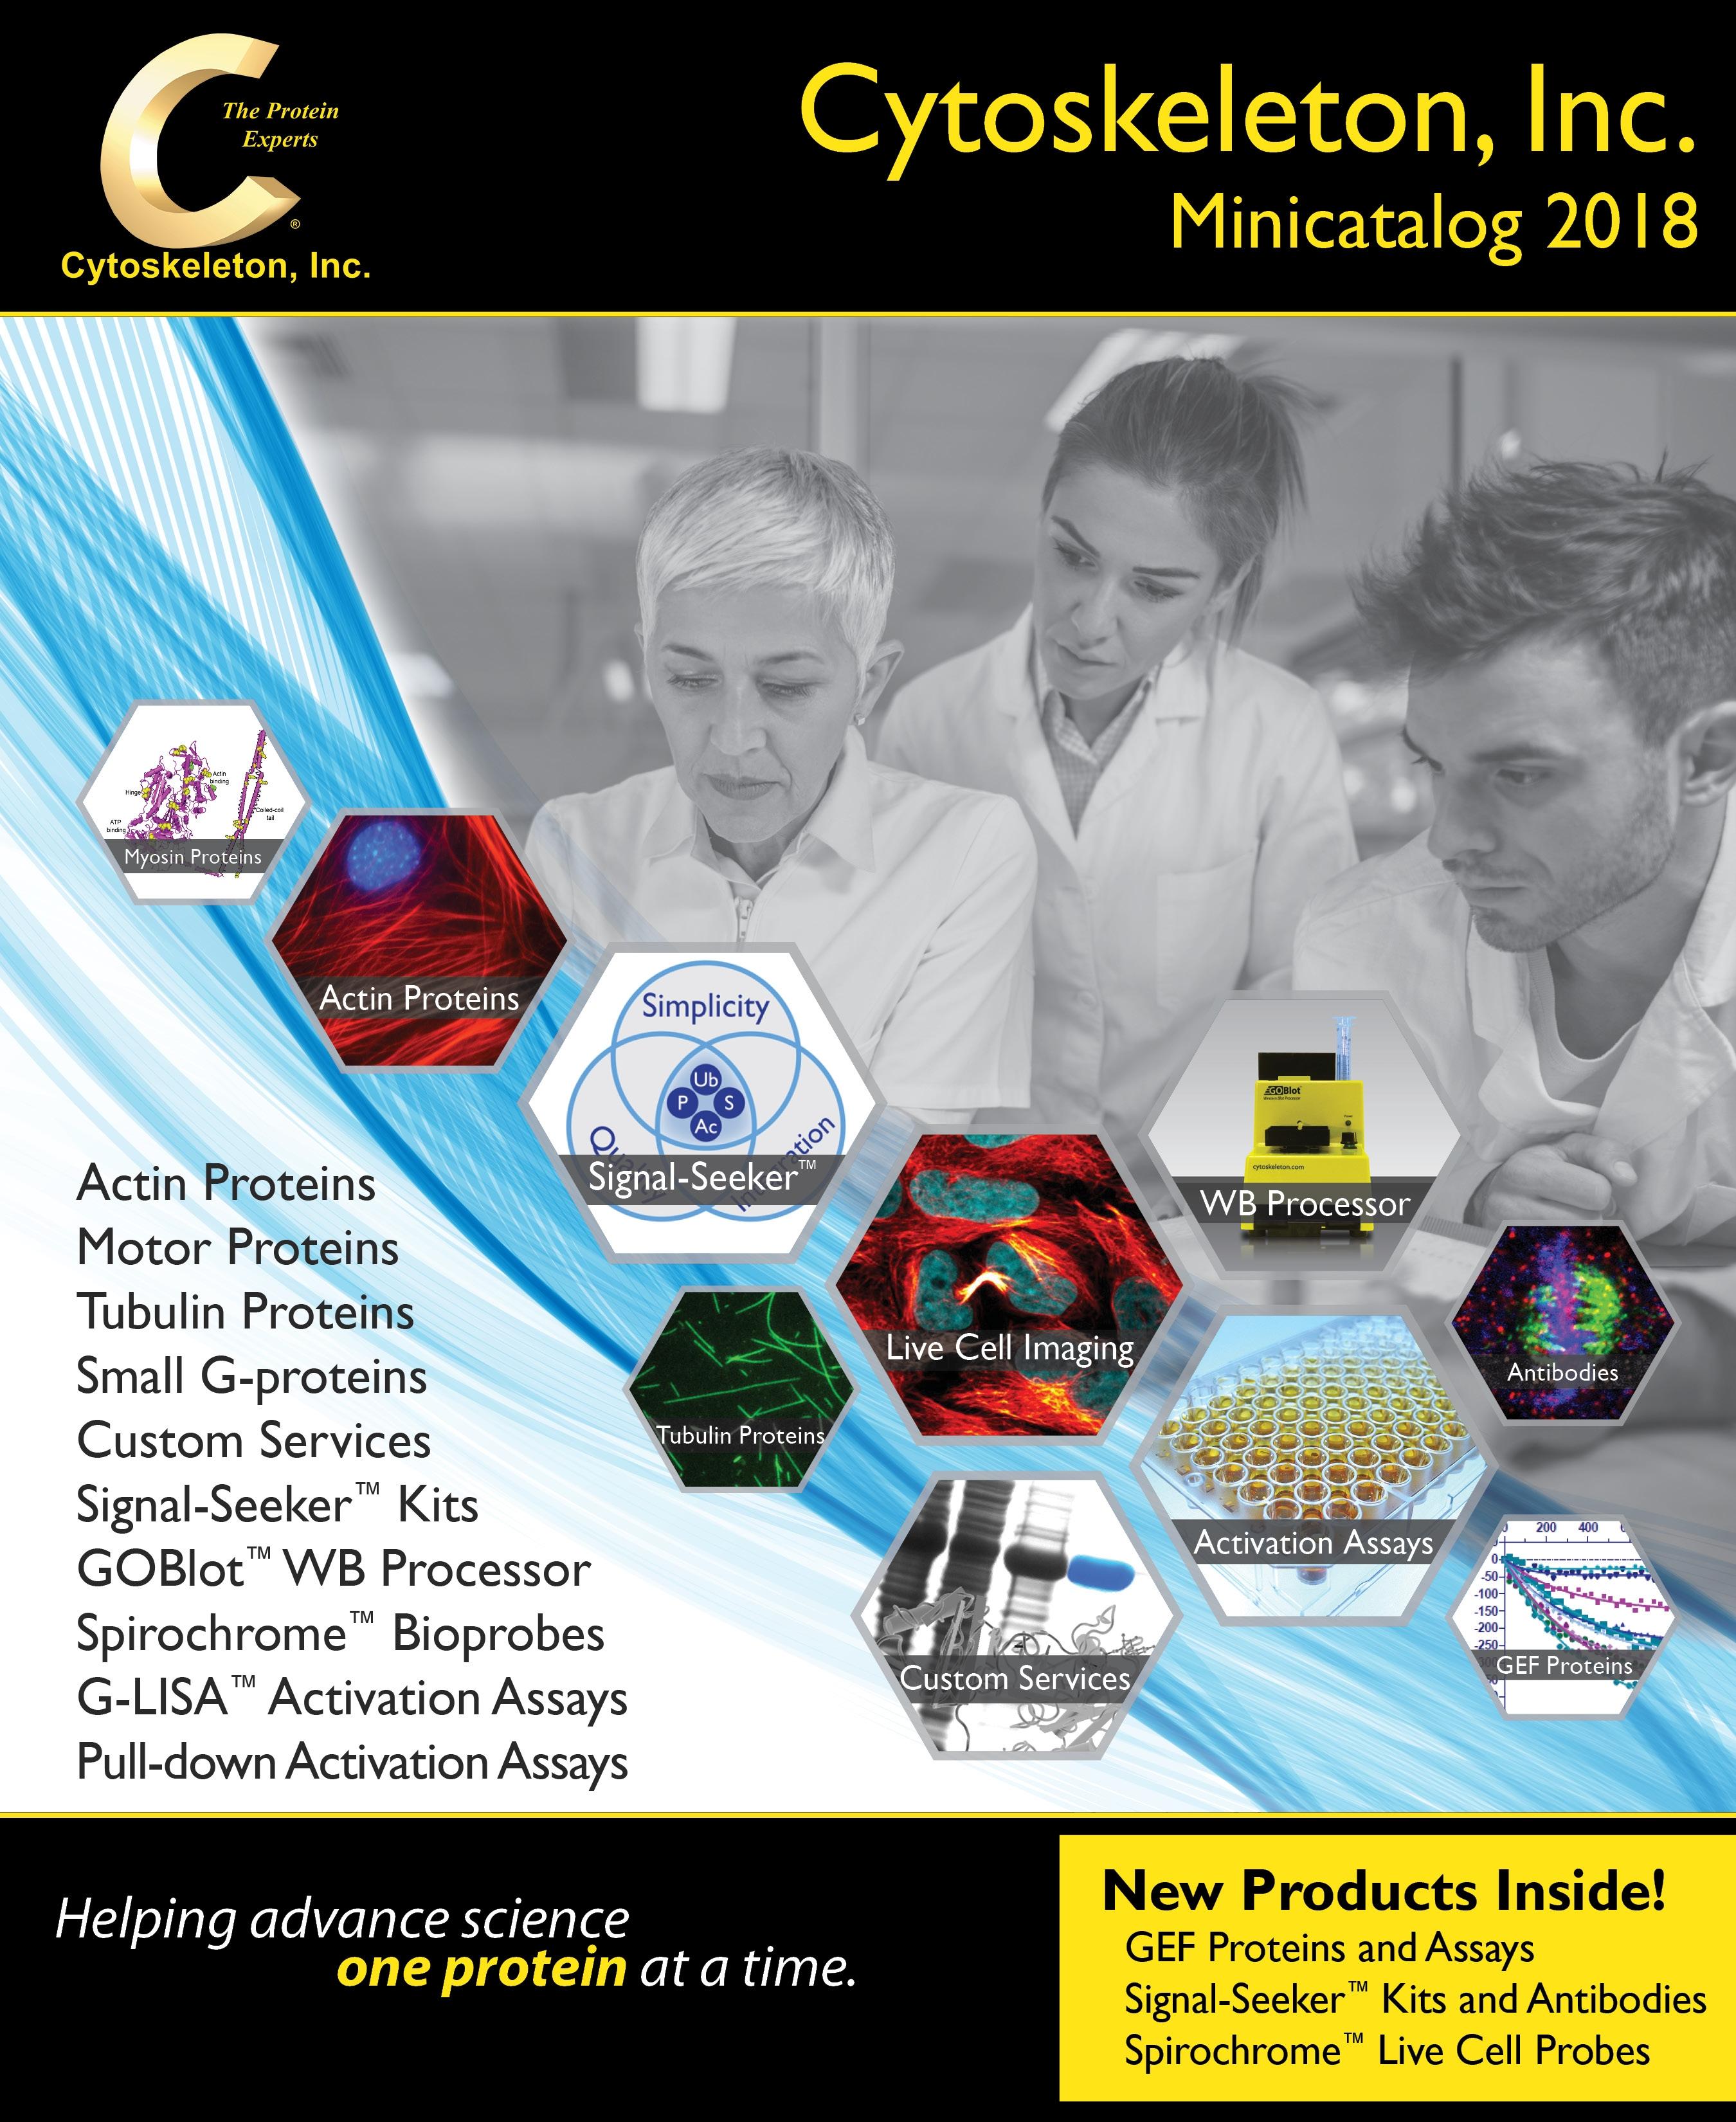 2018 Cytoskeleton Minicatalog Cover